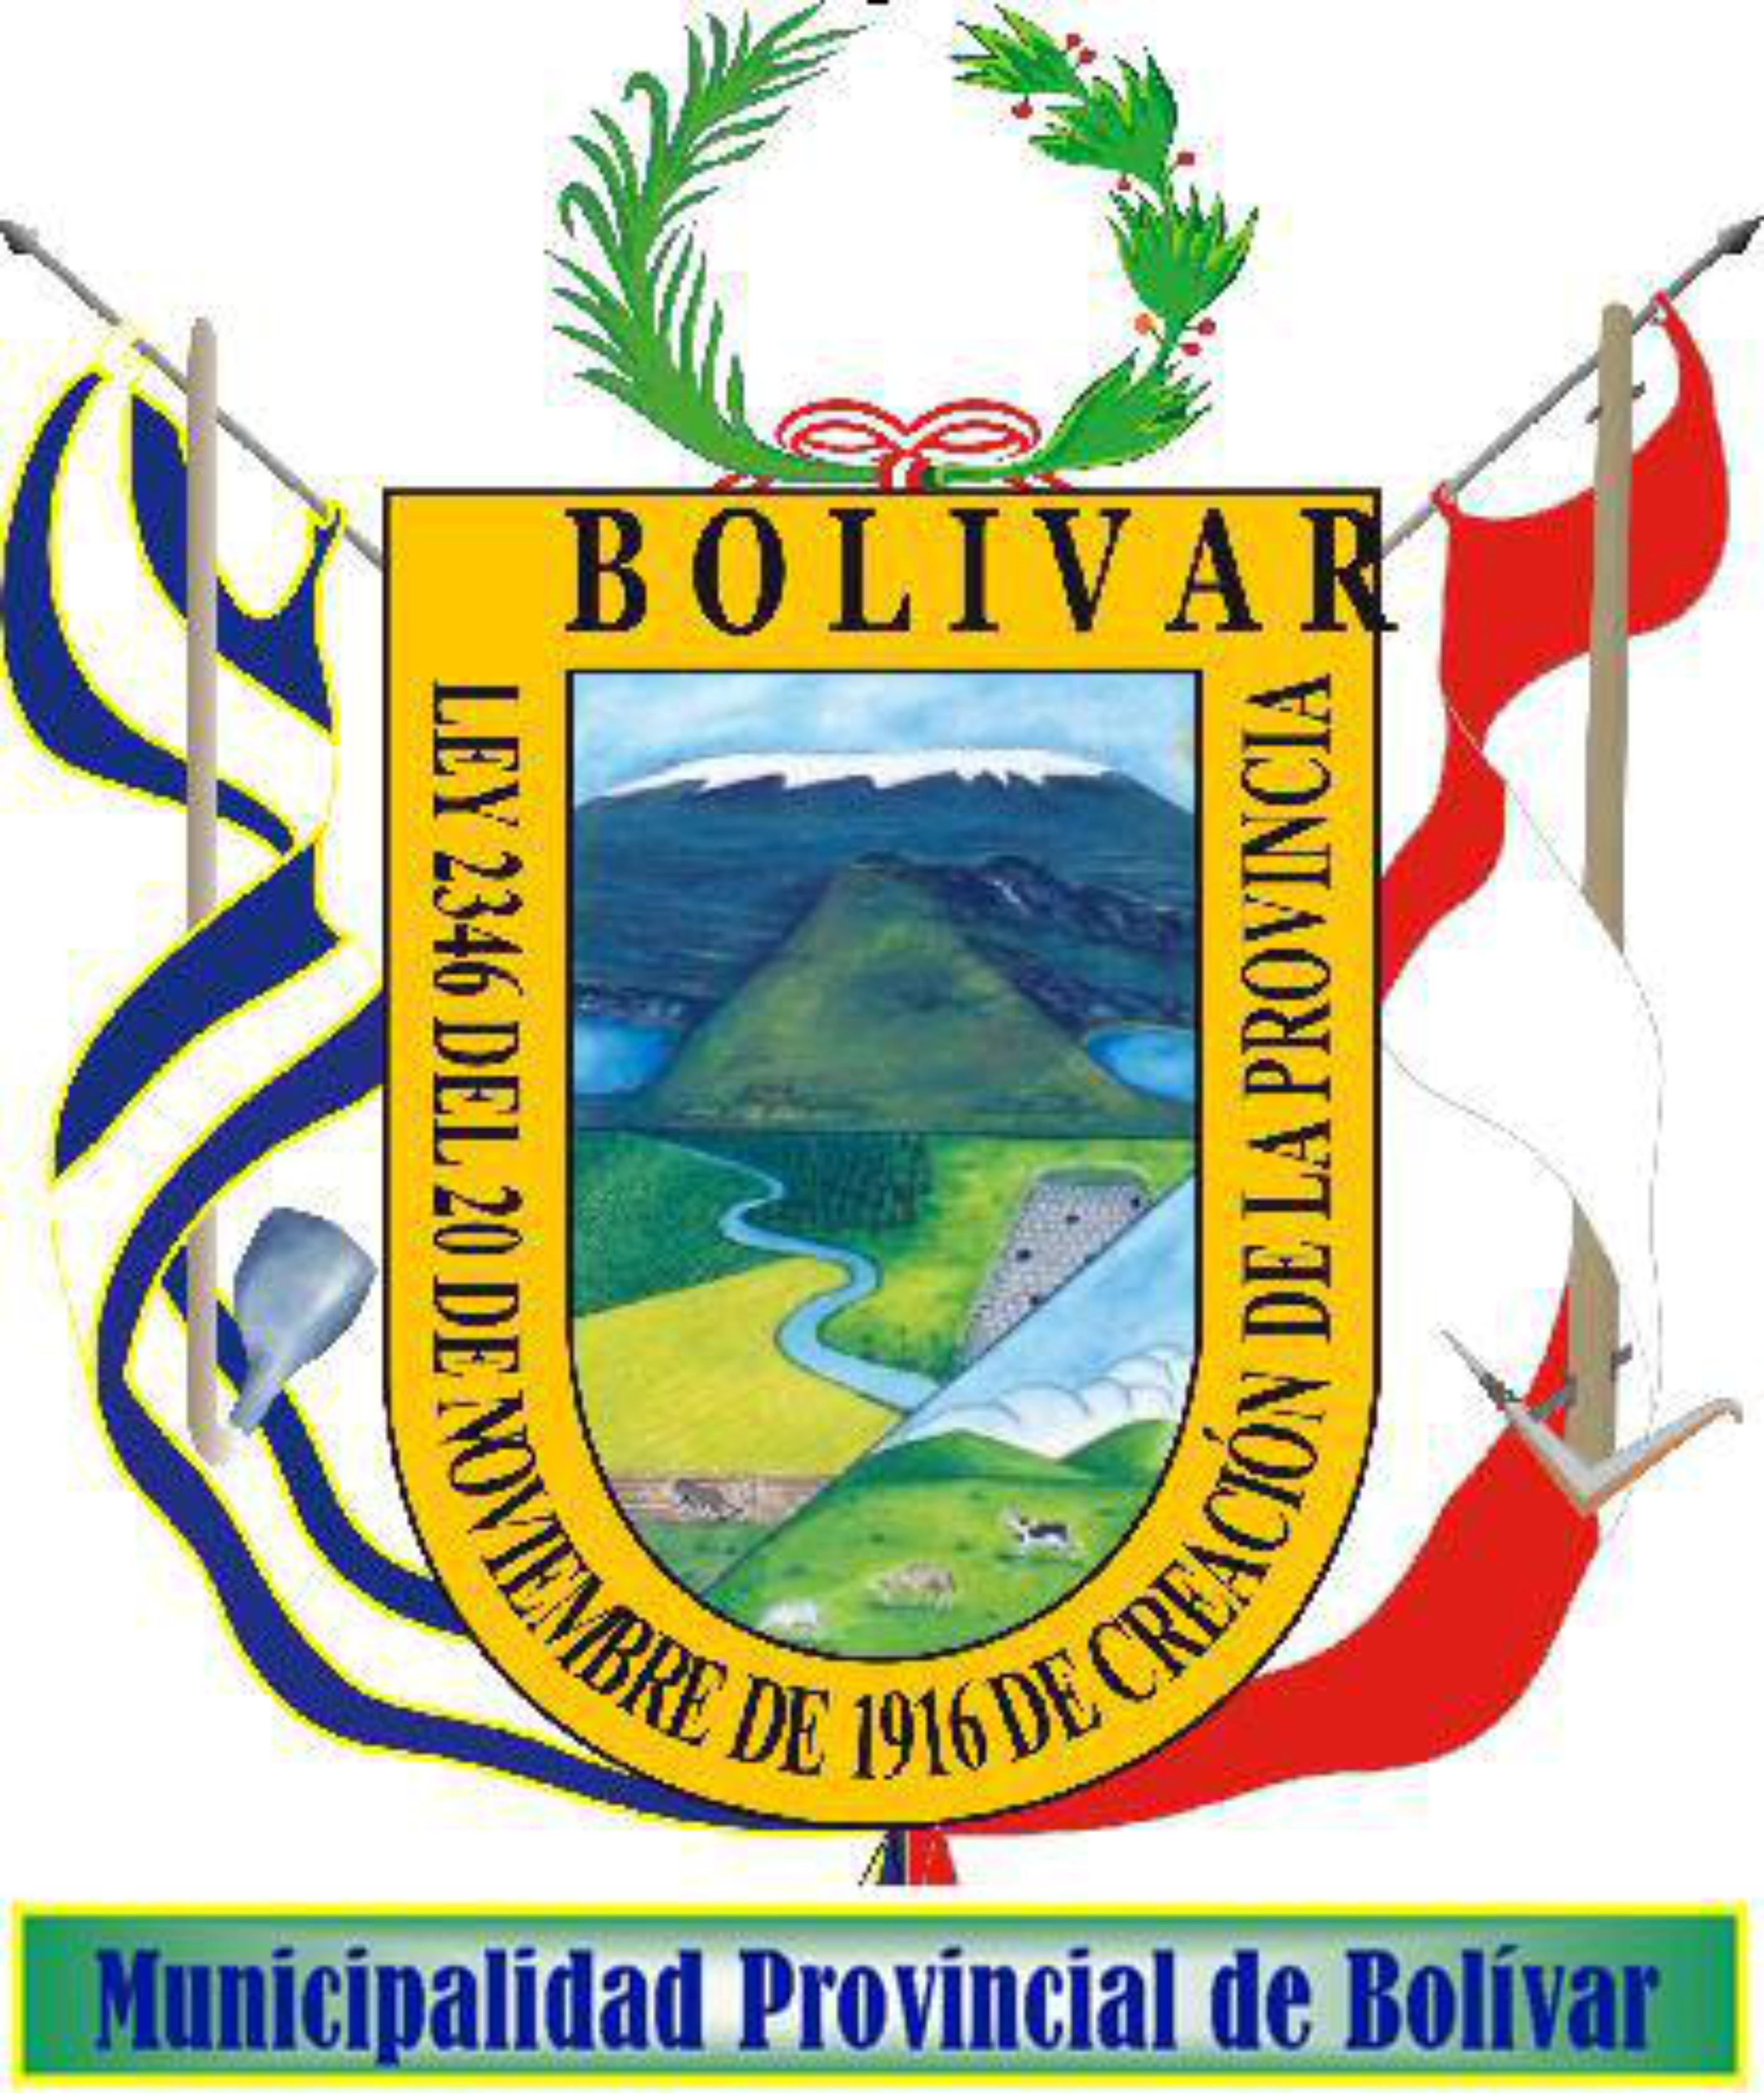 Municipalidad Provincial Bolivar